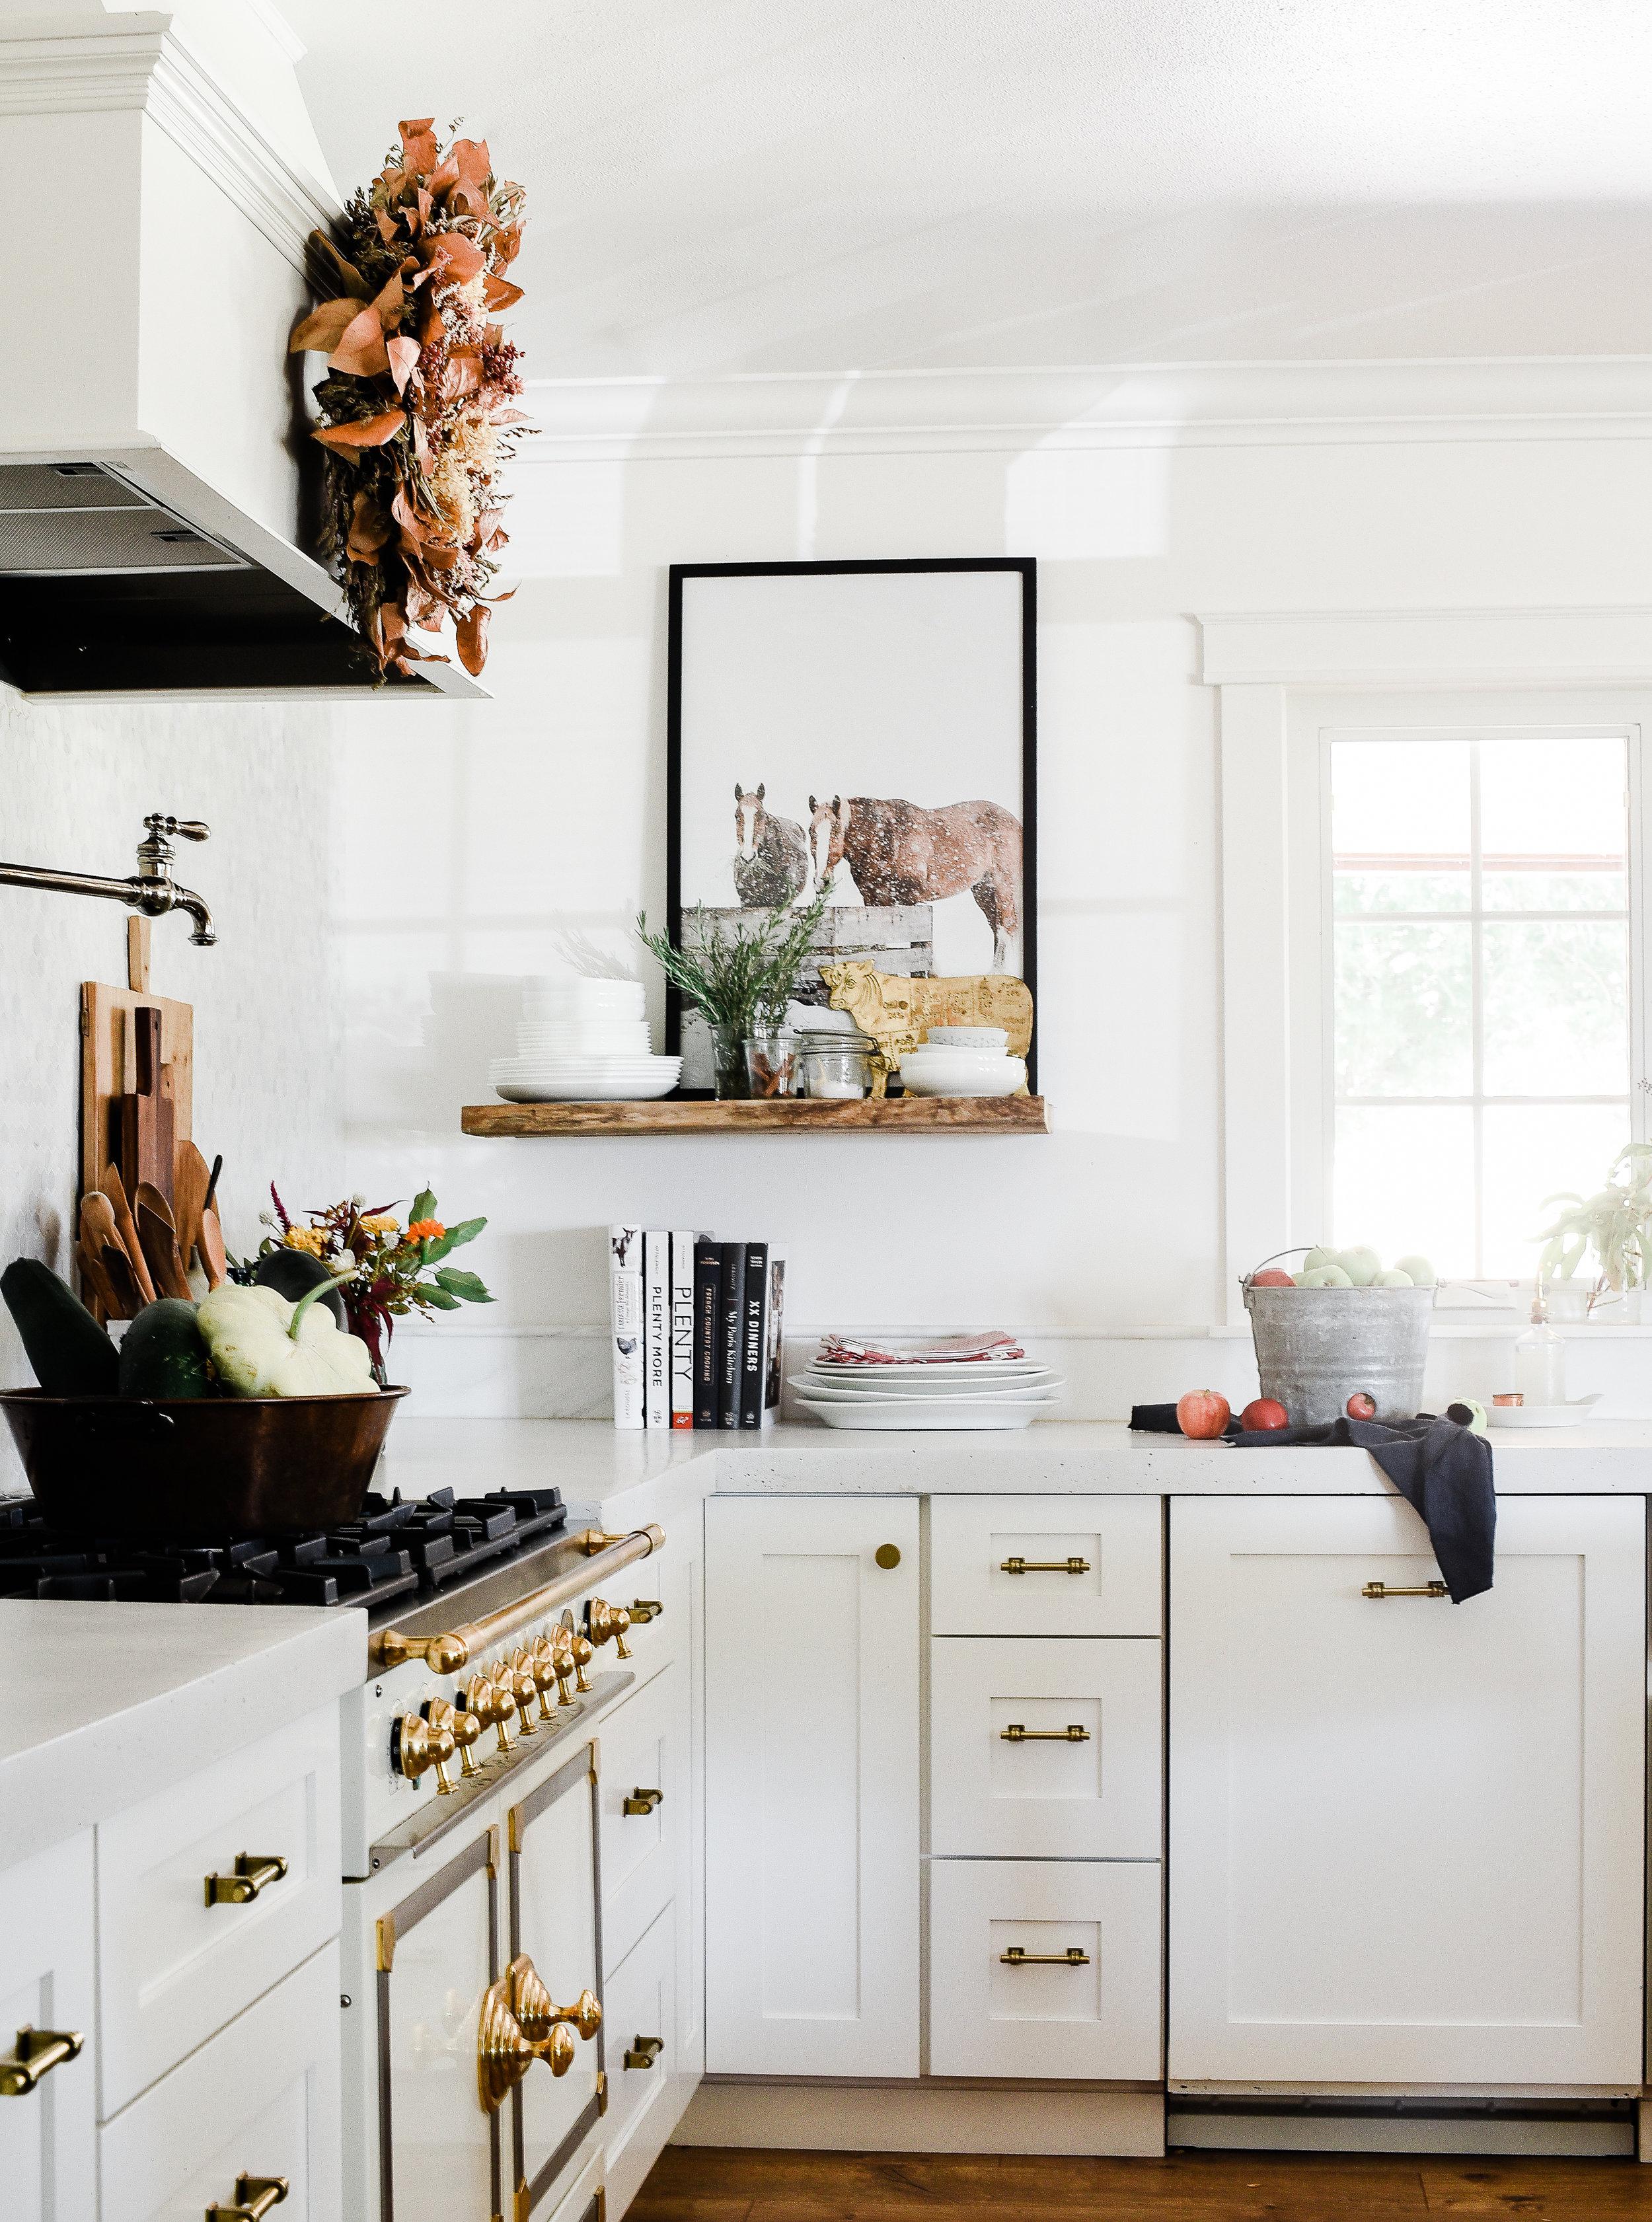 Fall Decorating Ideas: A Modern Farmhouse Kitchen